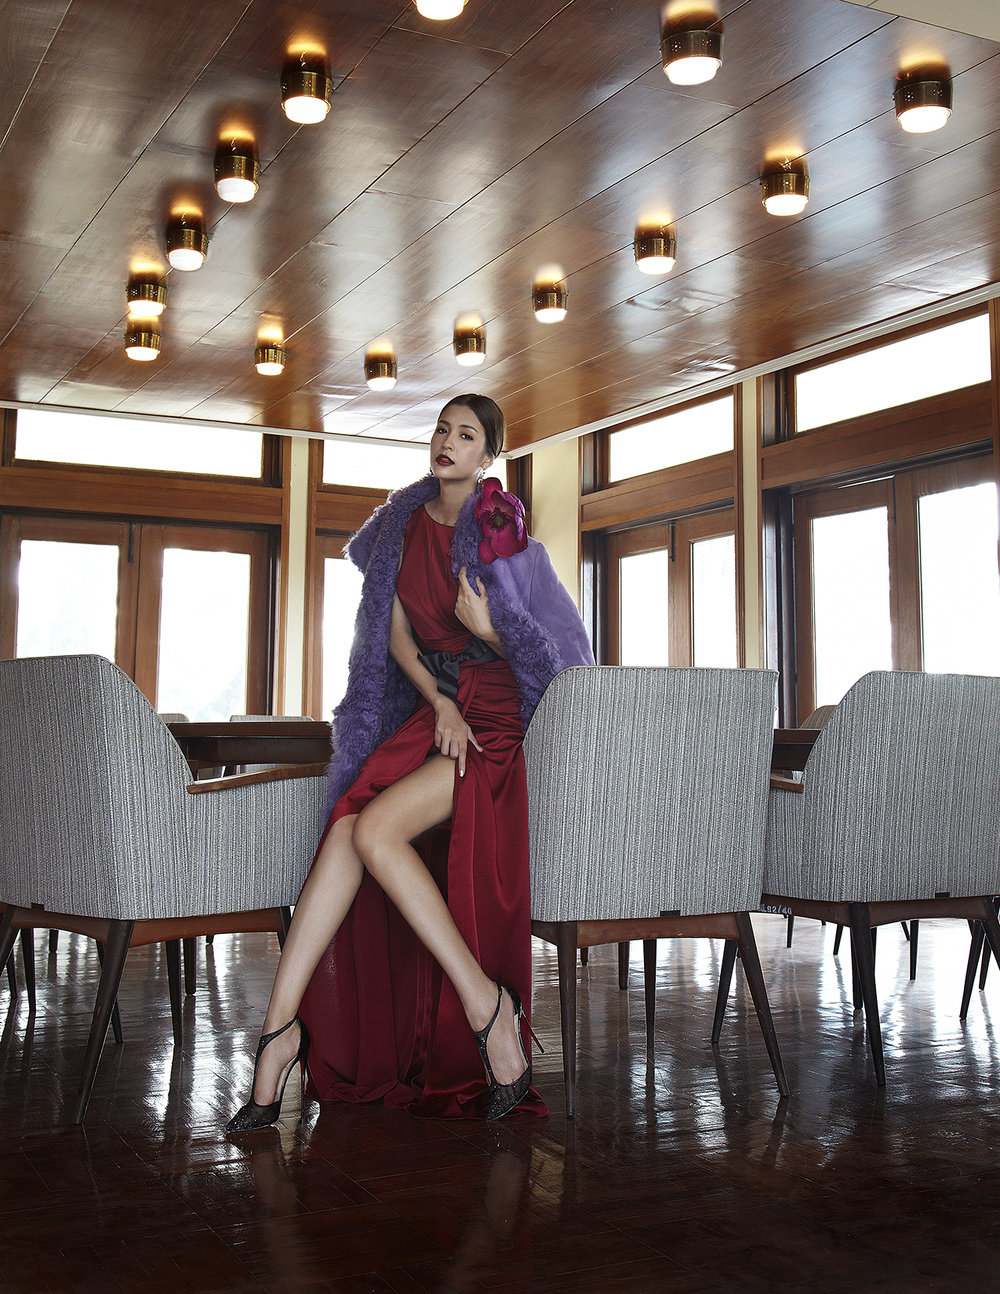 Actress : Marie Broenner @marie_broenner  Dress : Jemeriah / Fur Coat : Michael Kors / Shoes : Christian Louboutin  Location :บ้านพักรับรองแหลมแท่น